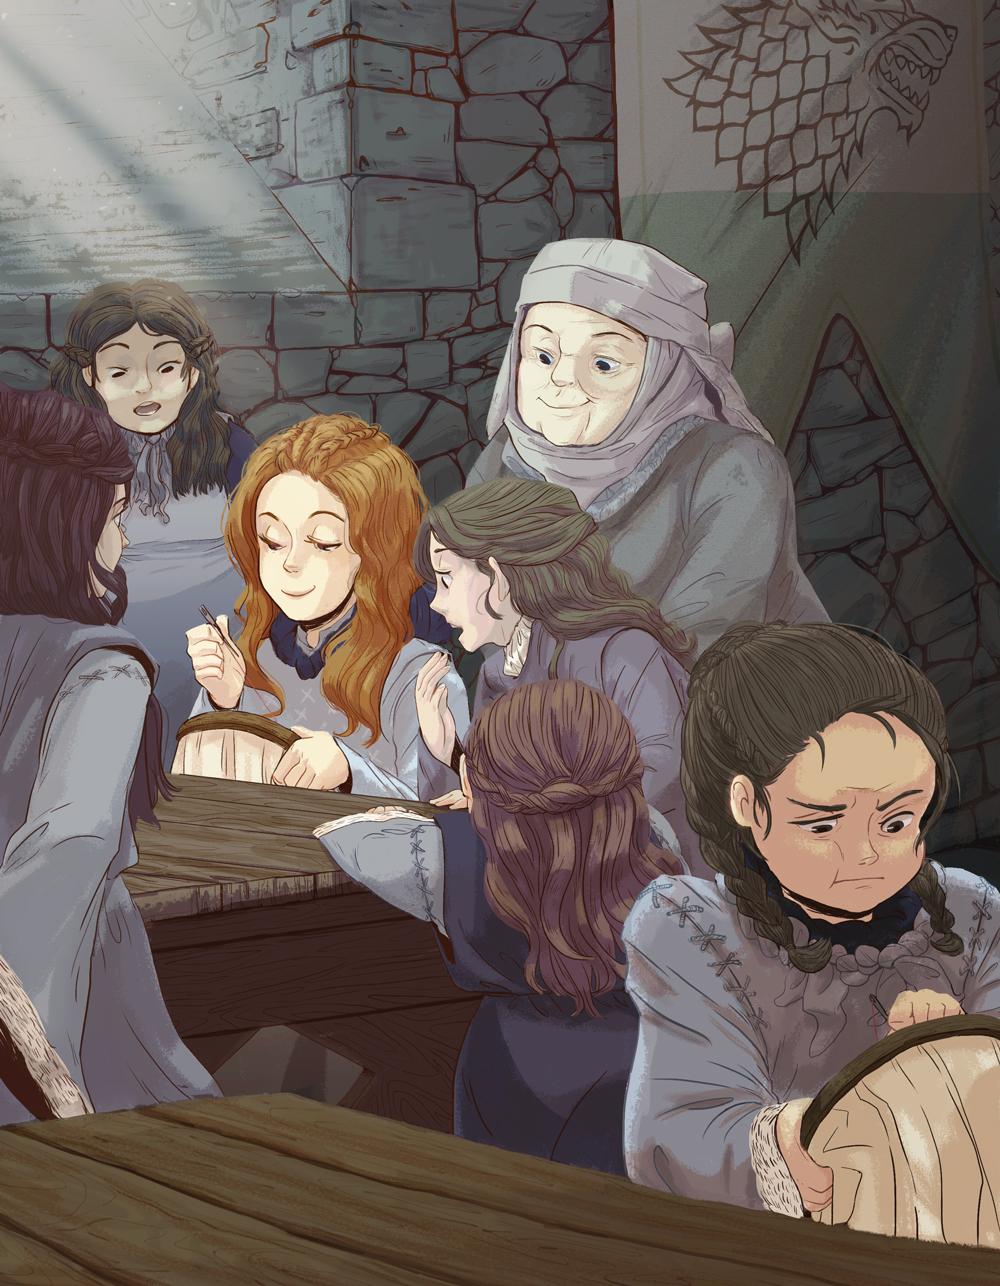 Game of Thrones - Stark Sisters